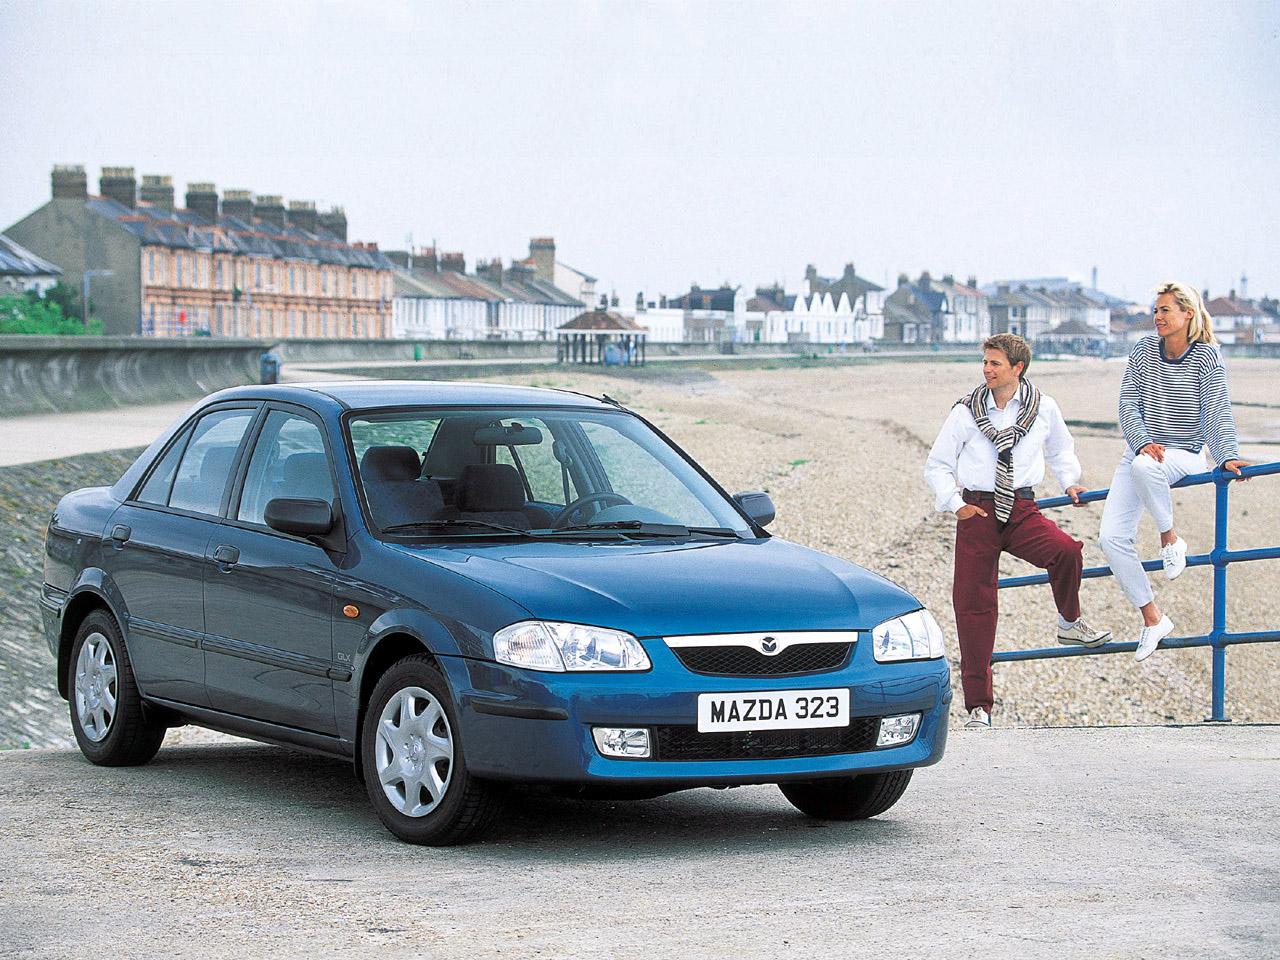 Kelebihan Mazda 323 2000 Spesifikasi